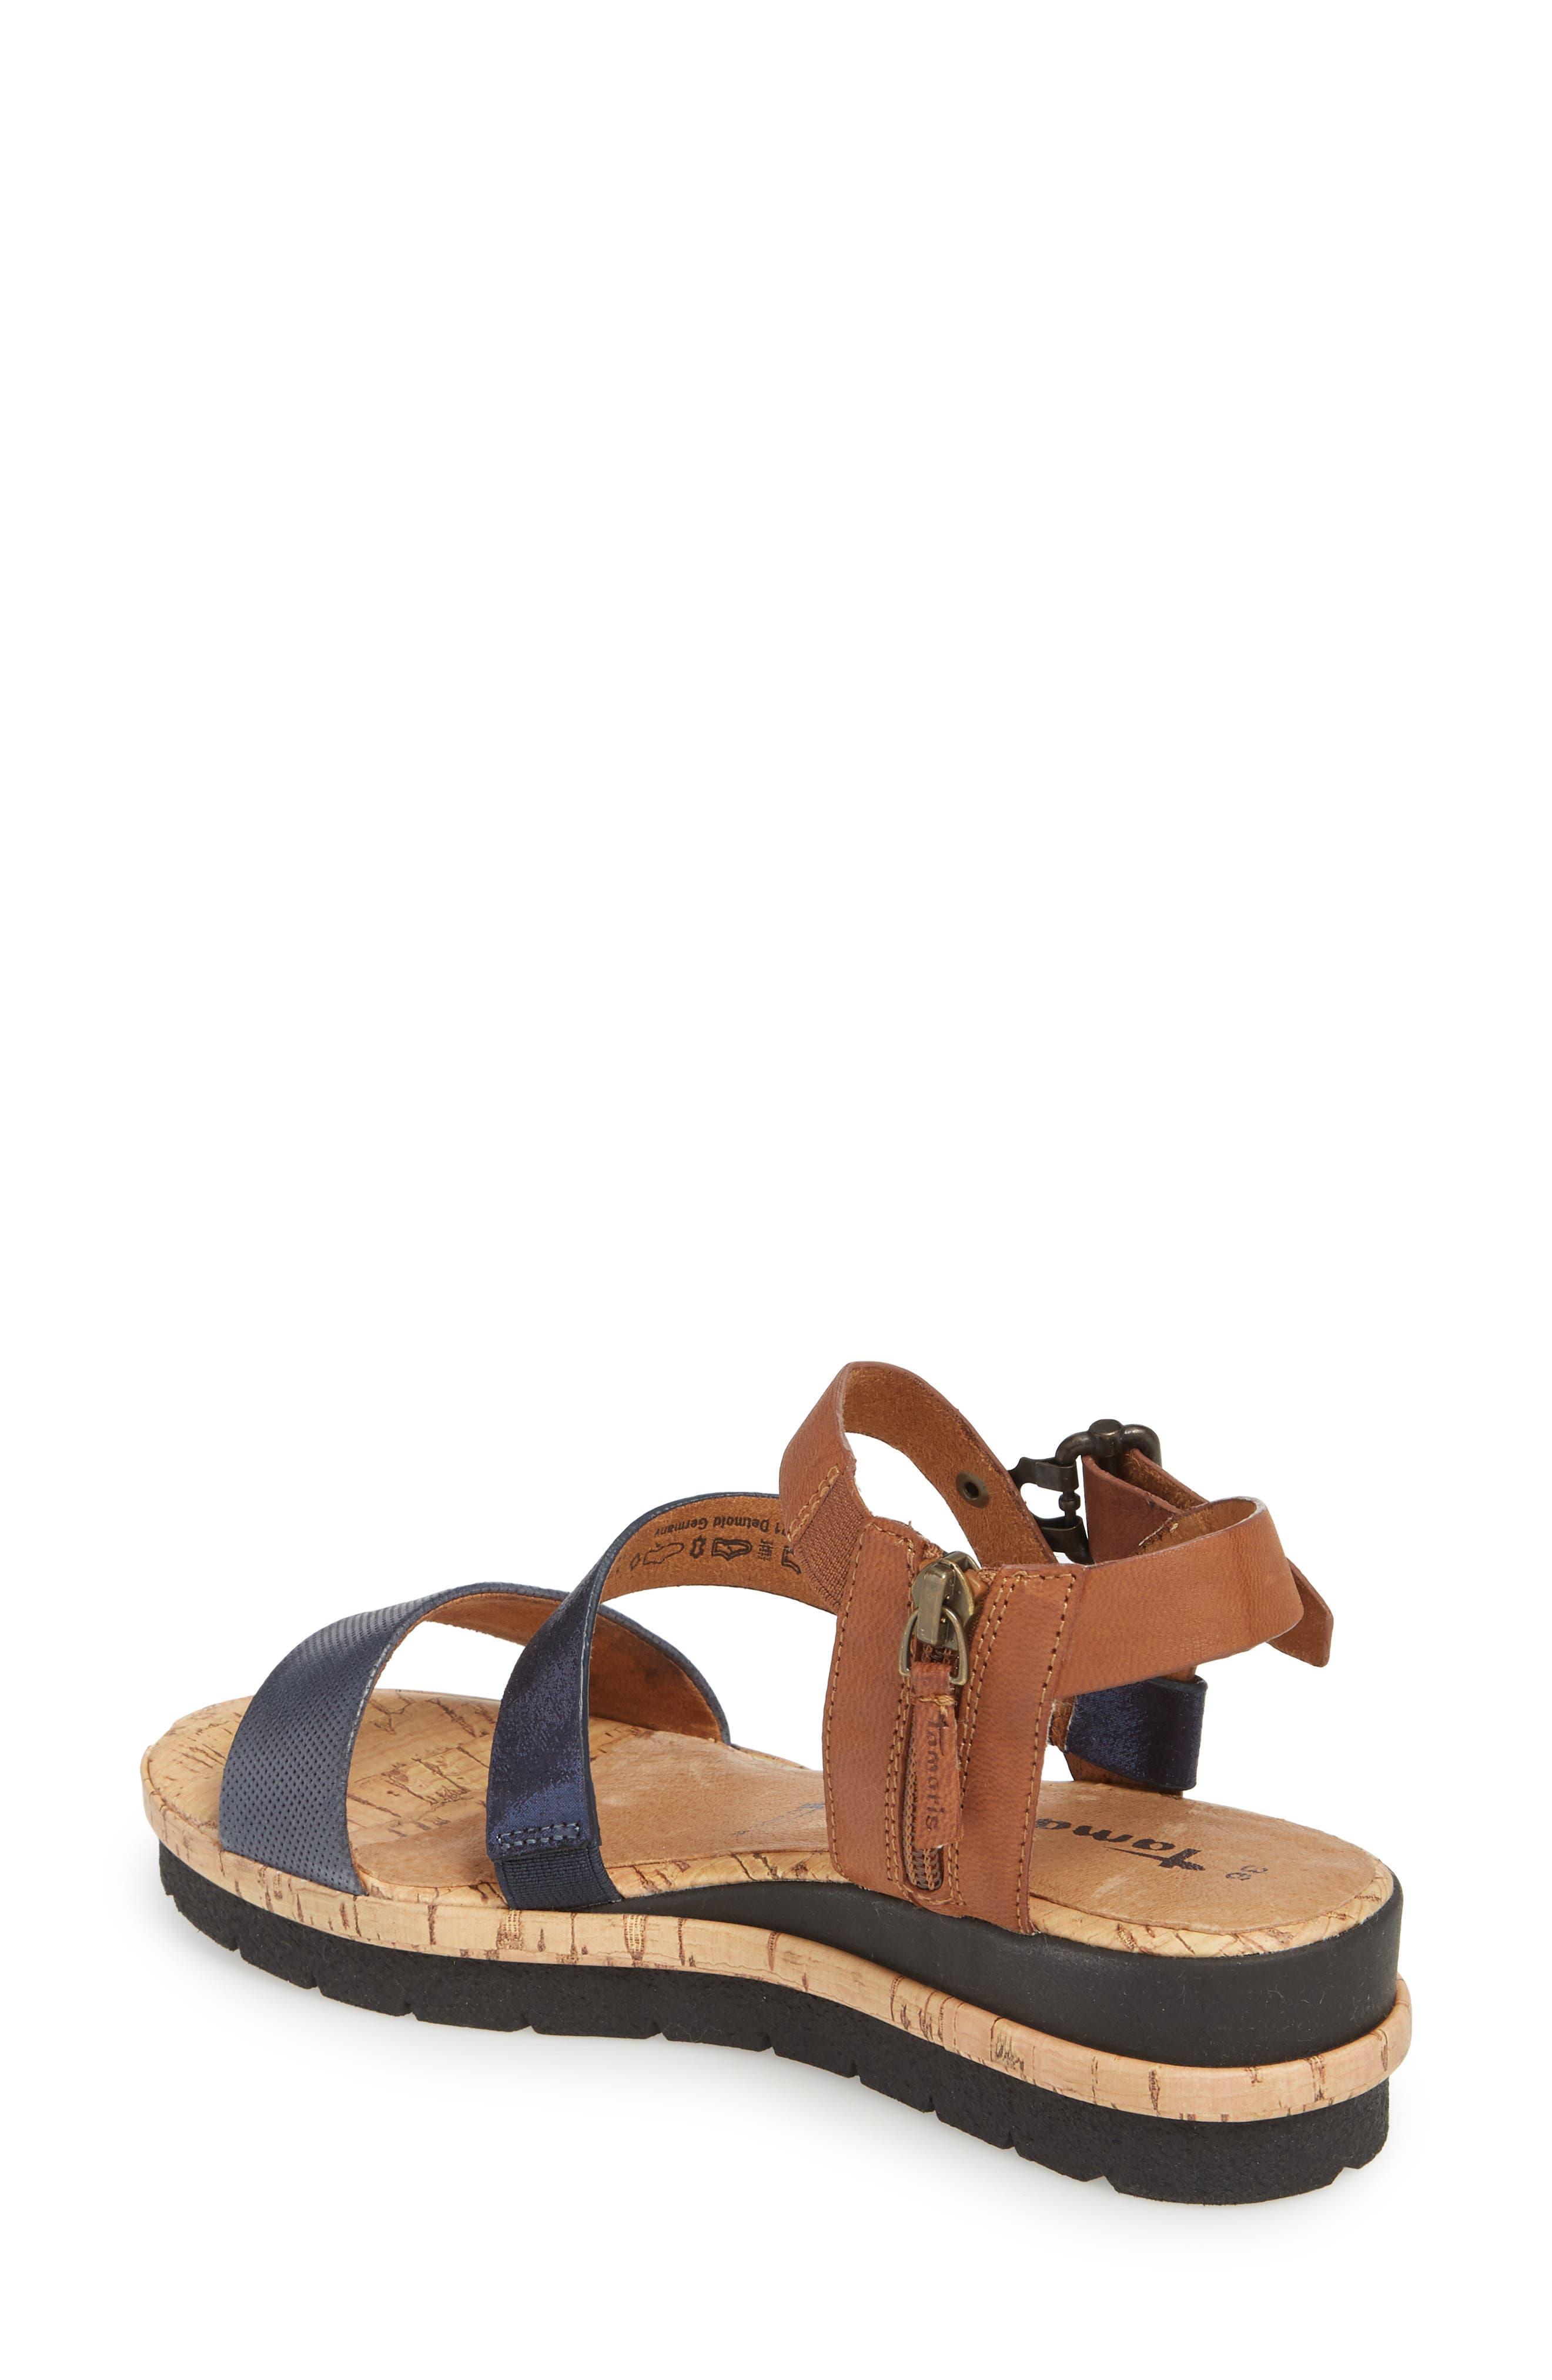 Eda Diagonal Strap Wedge Sandal,                             Alternate thumbnail 2, color,                             413